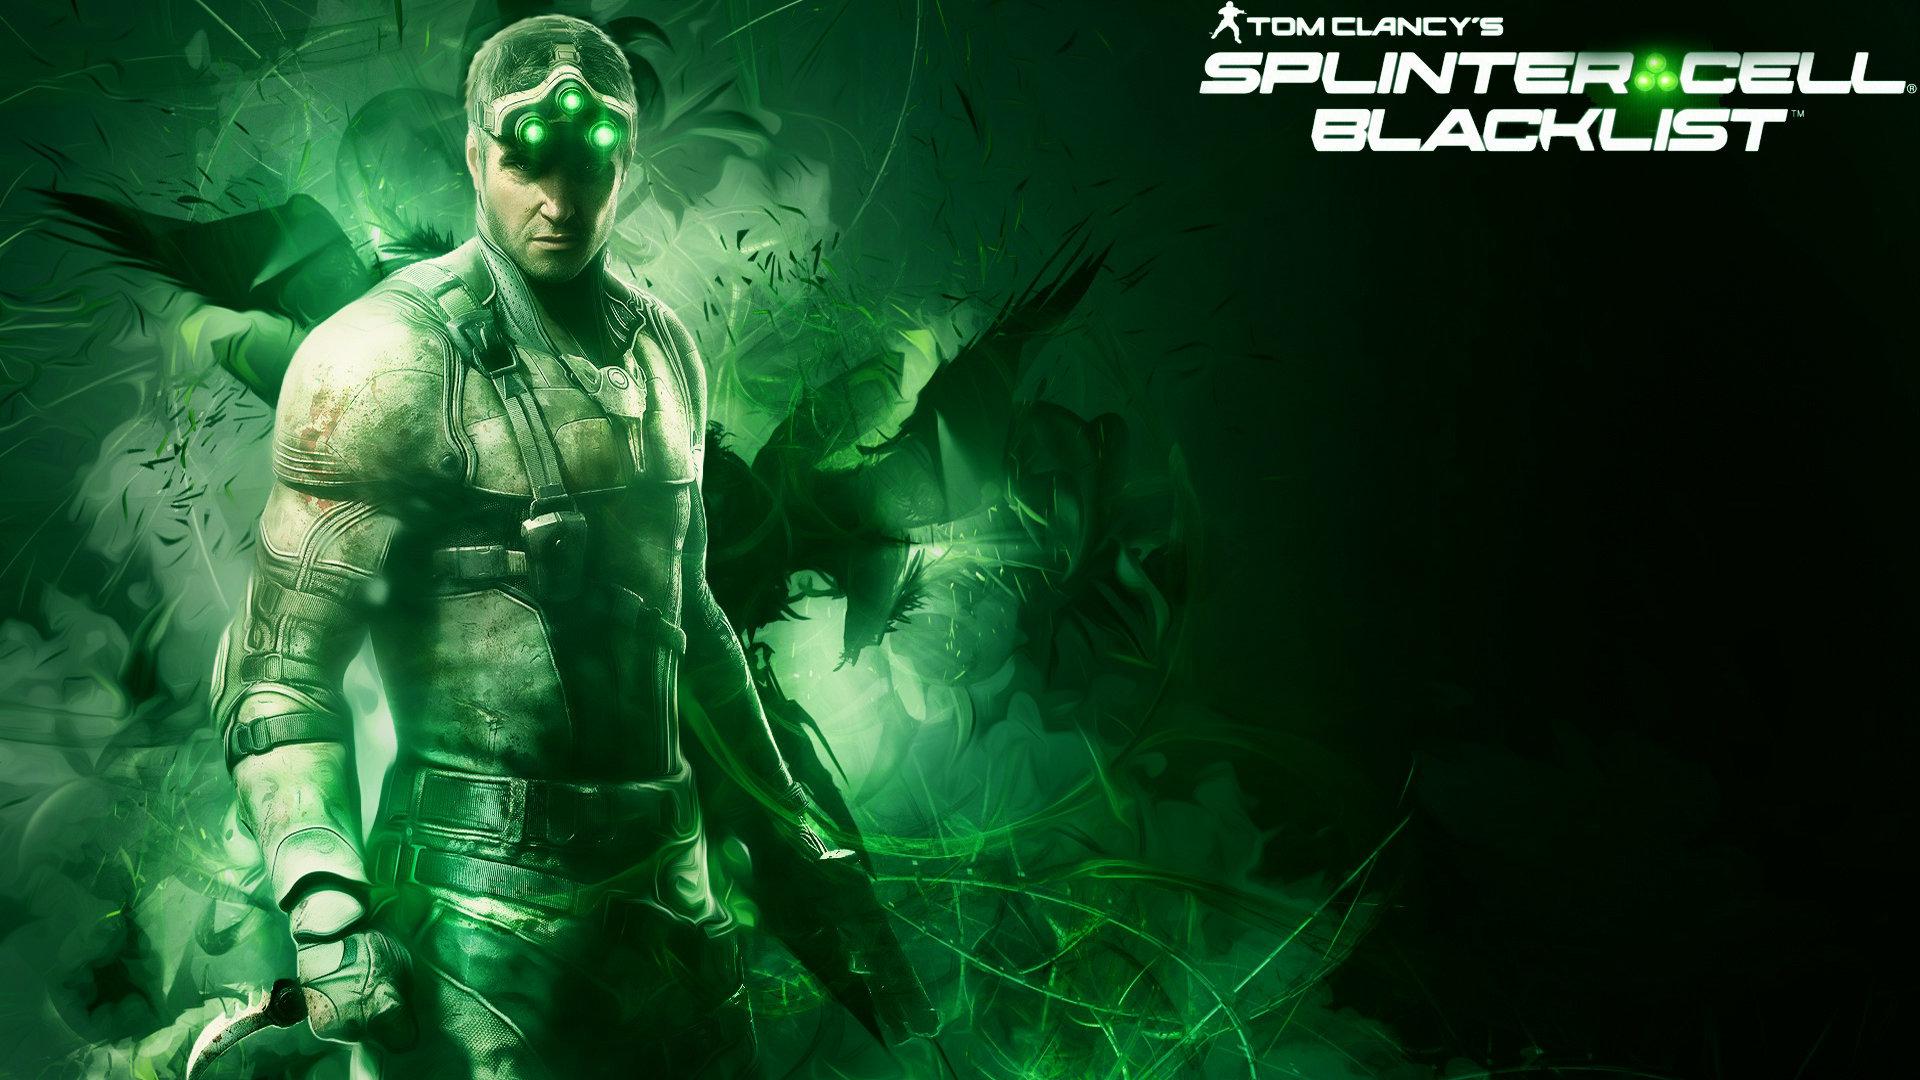 Splinter Cell: Blacklist Spies vs. Mercs trailer released.